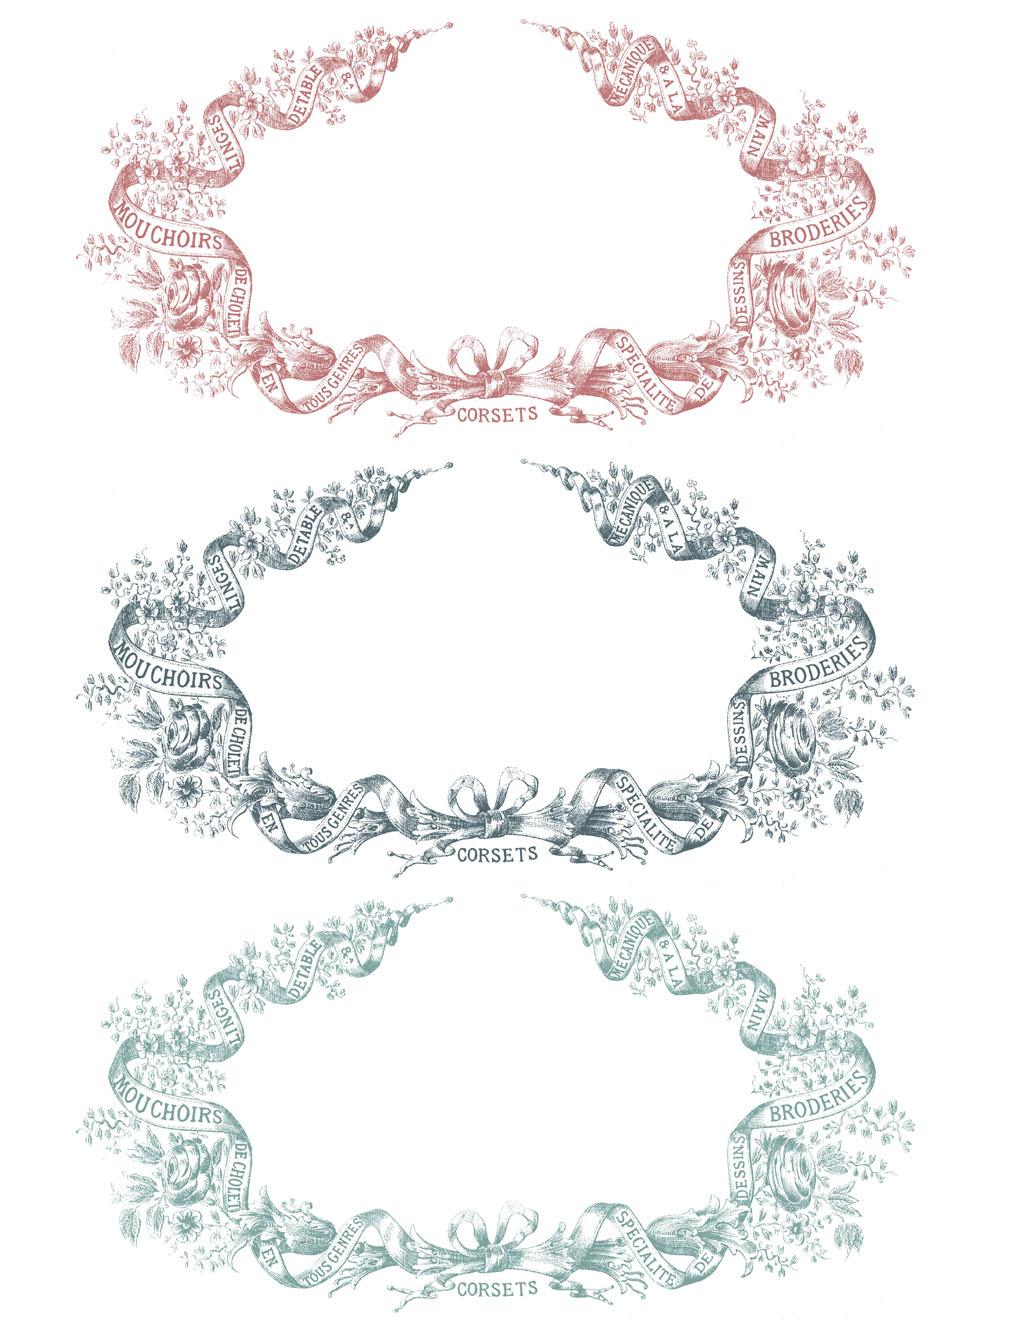 image relating to Printable Frames named Traditional Clip Artwork - French Ephemera Frames Extravaganza